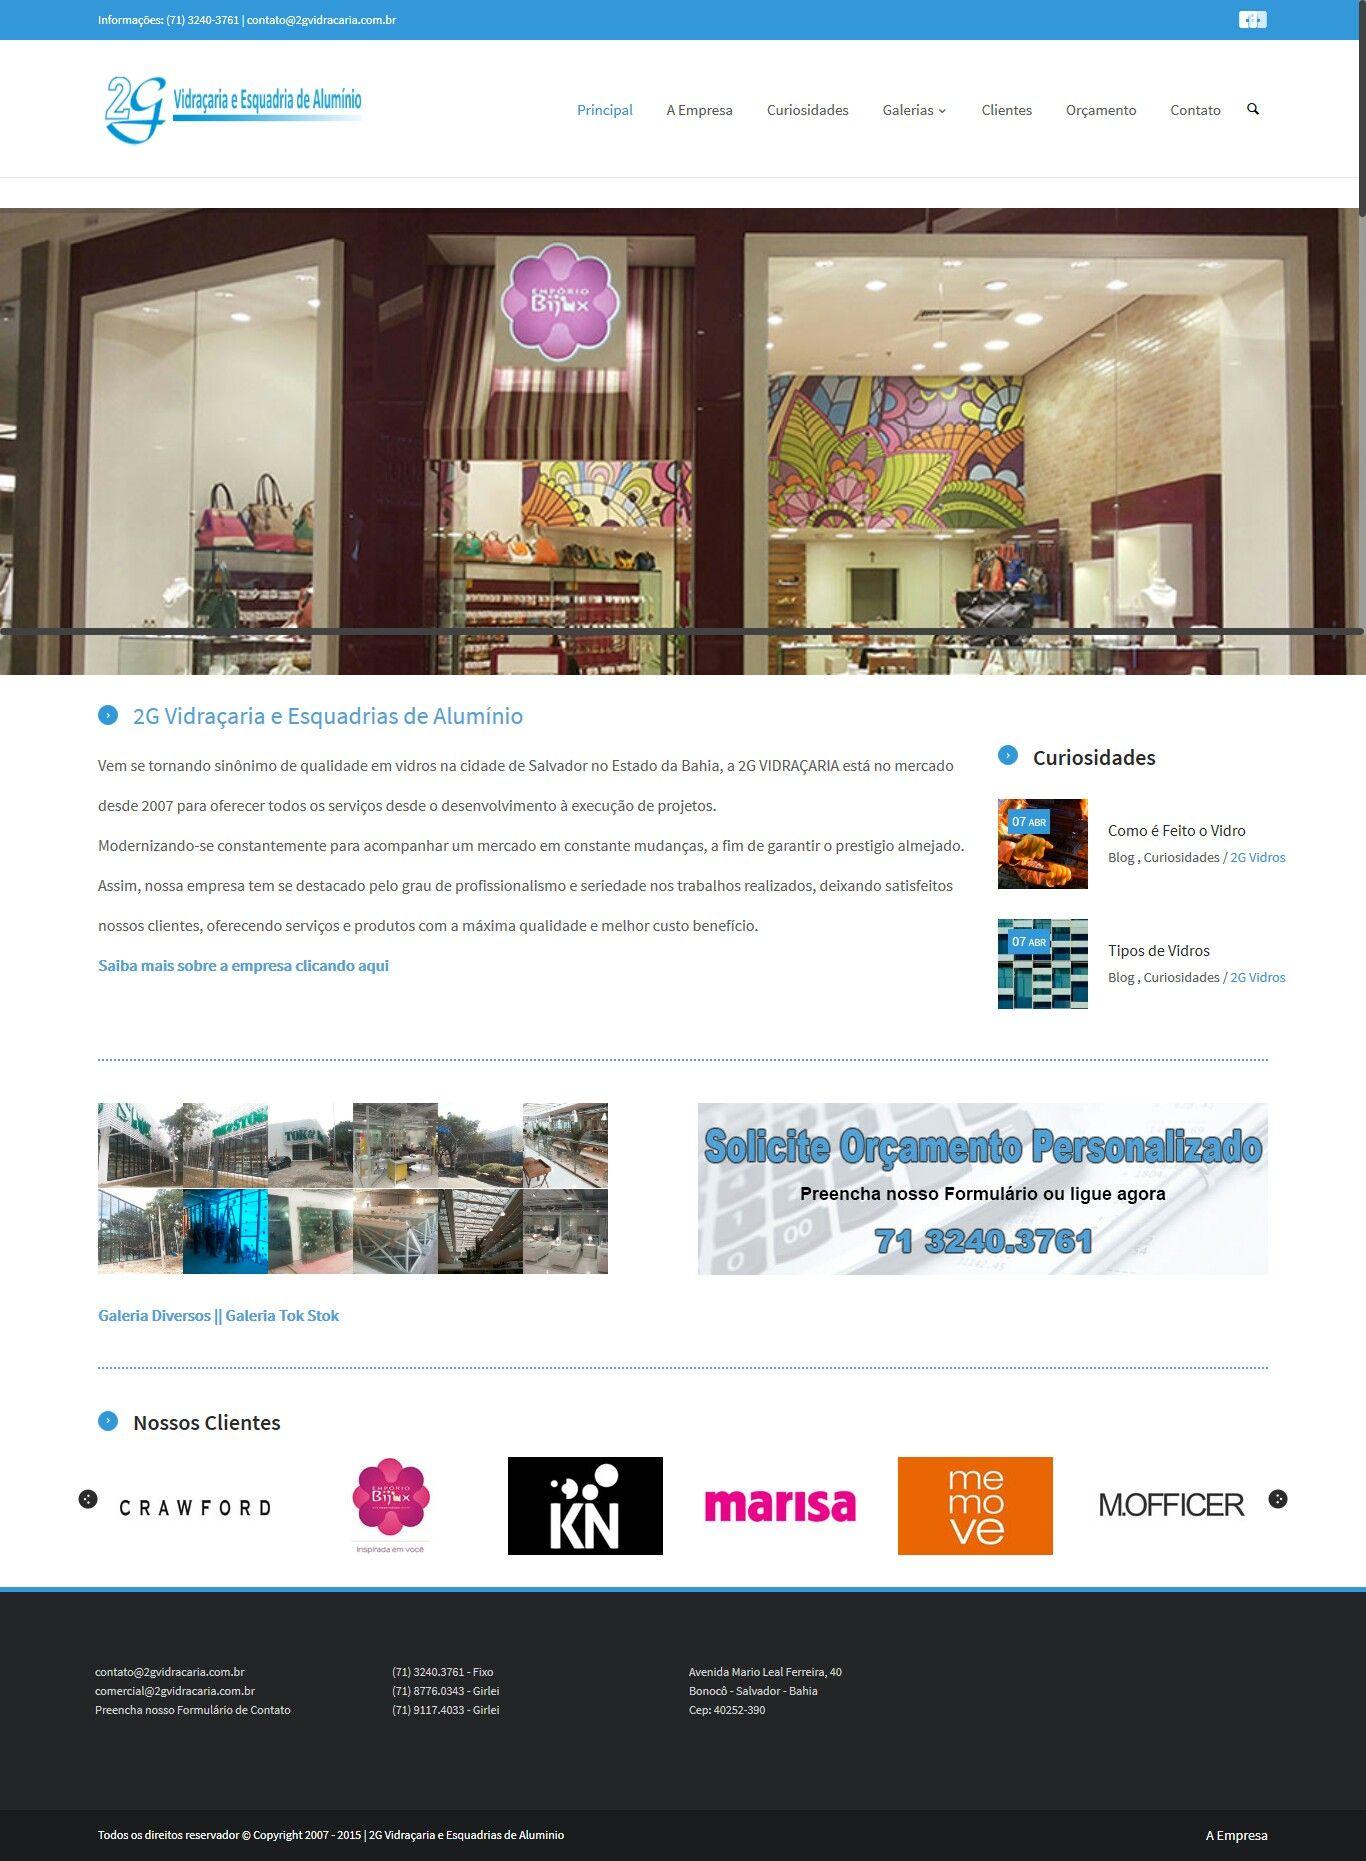 Website - 2G Vidraçaria